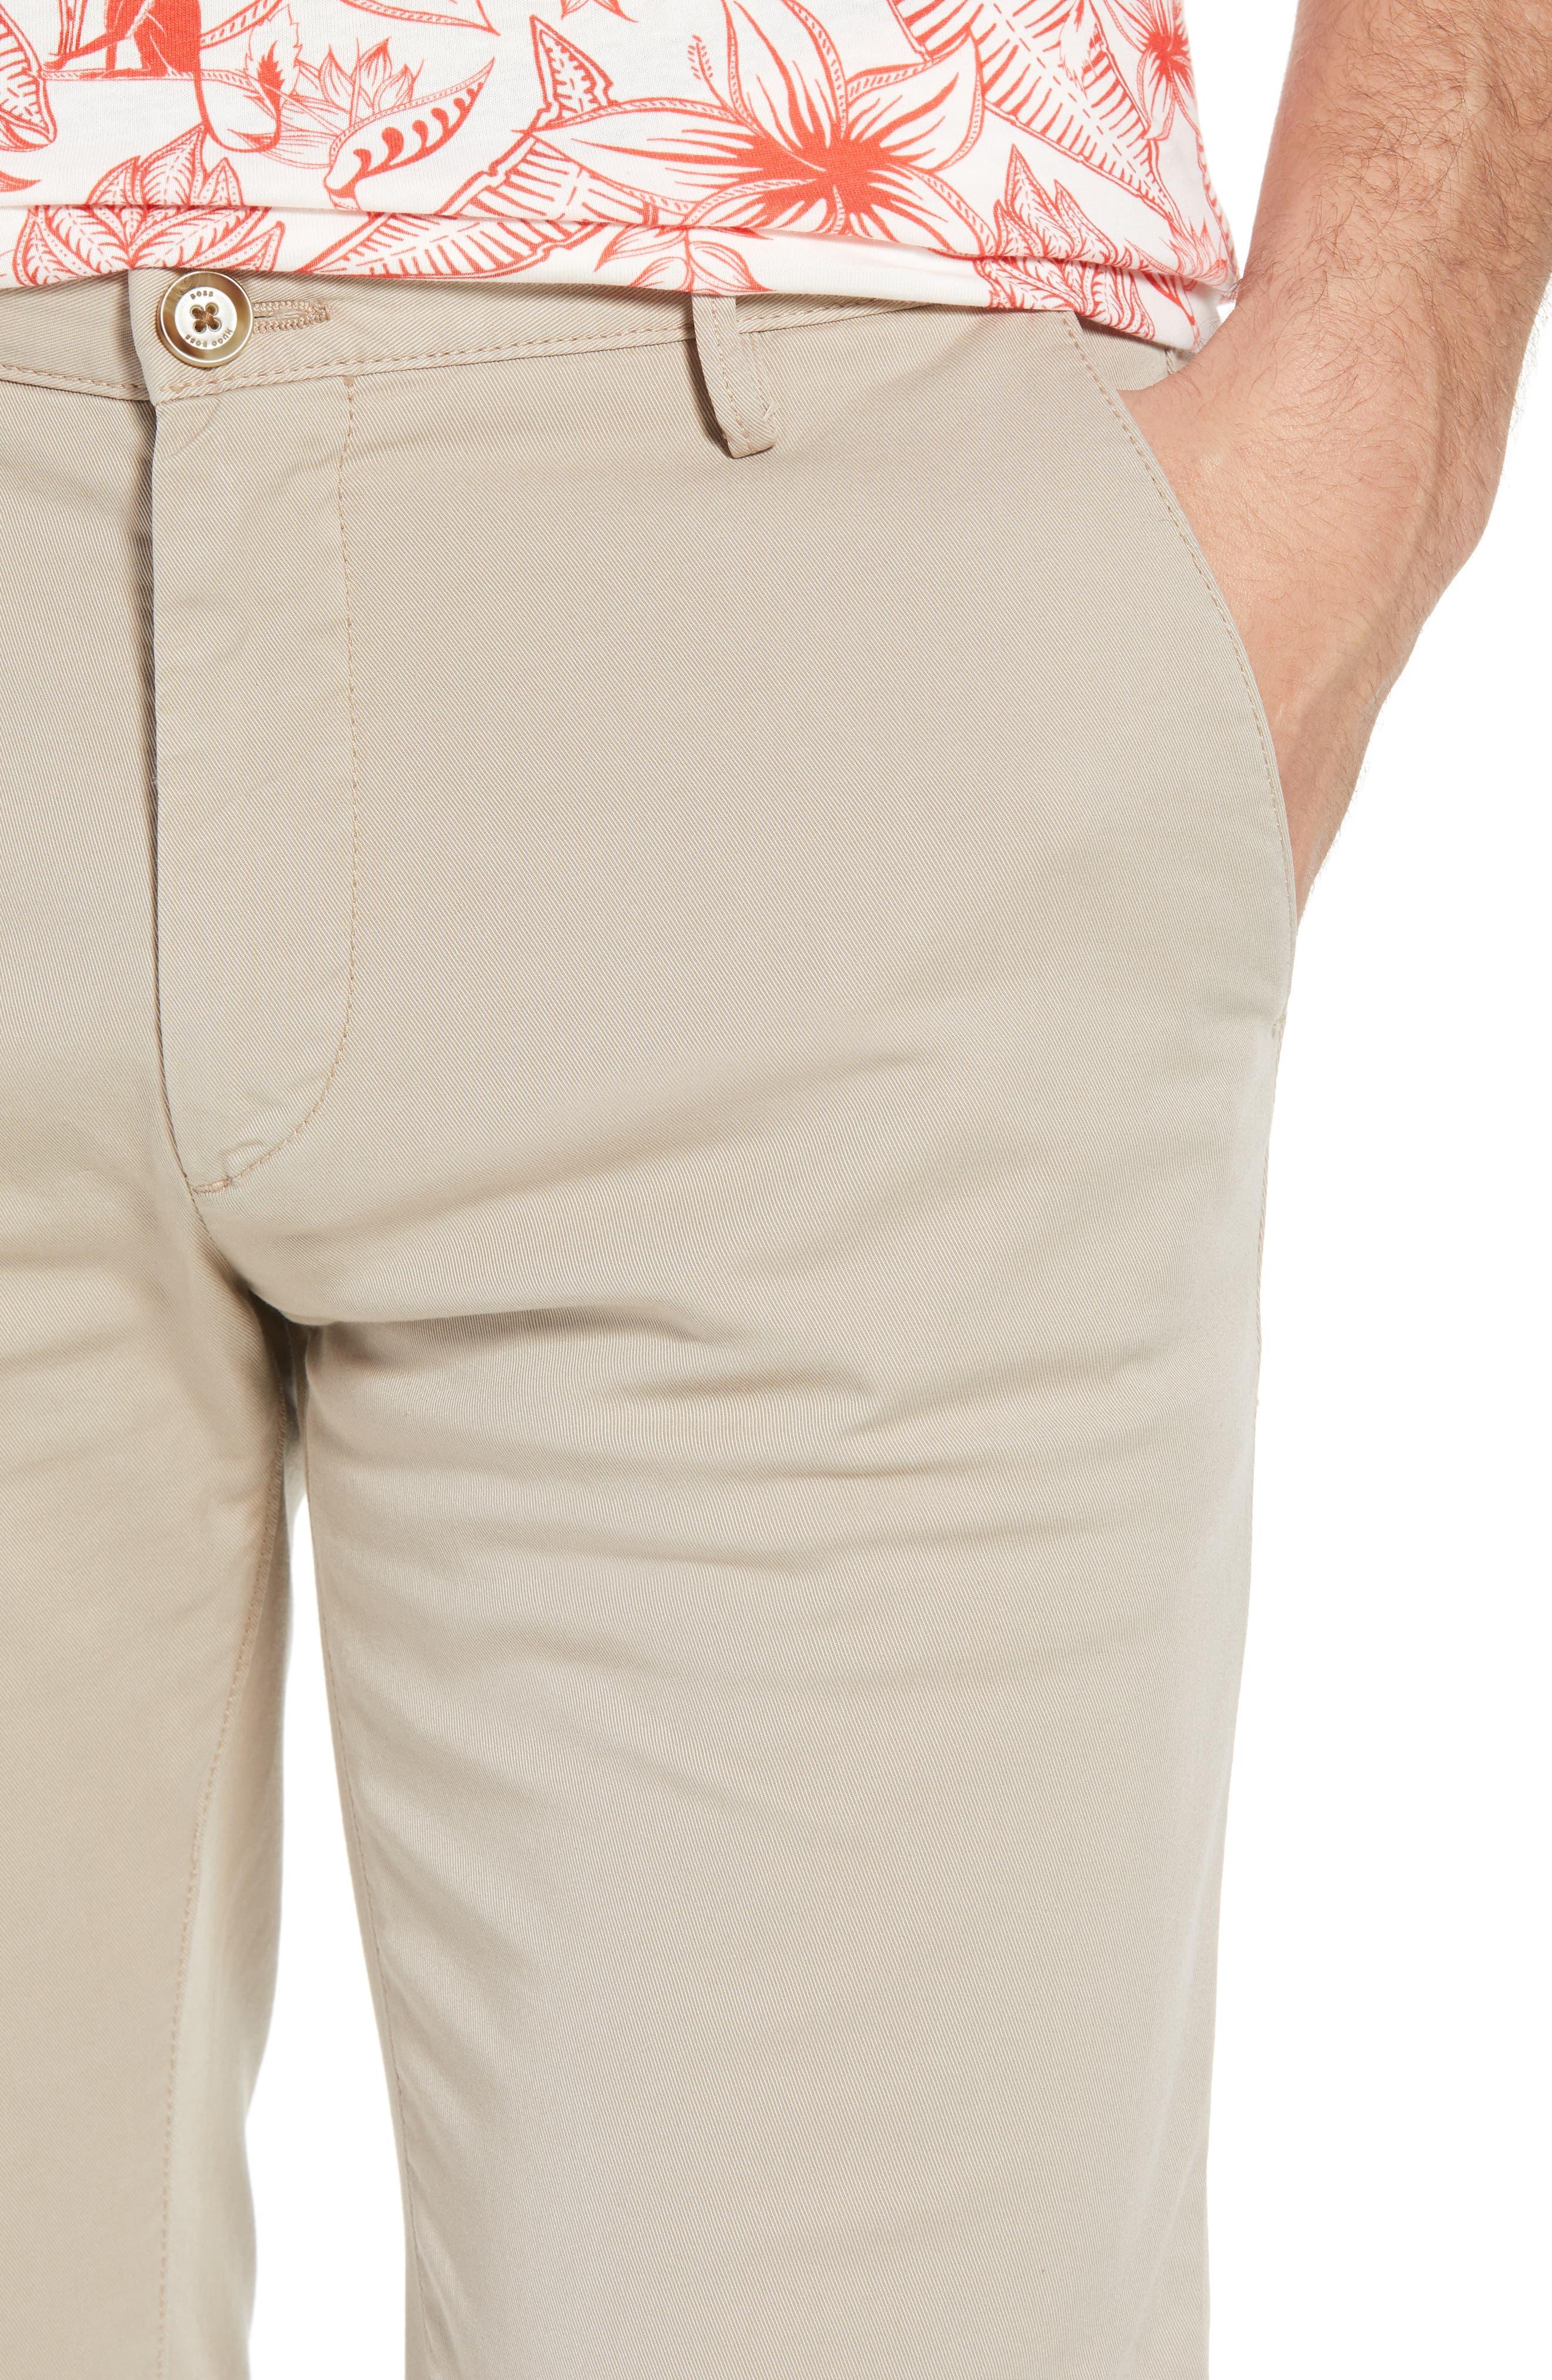 Rice Slim Fit Chino Pants,                             Alternate thumbnail 4, color,                             200